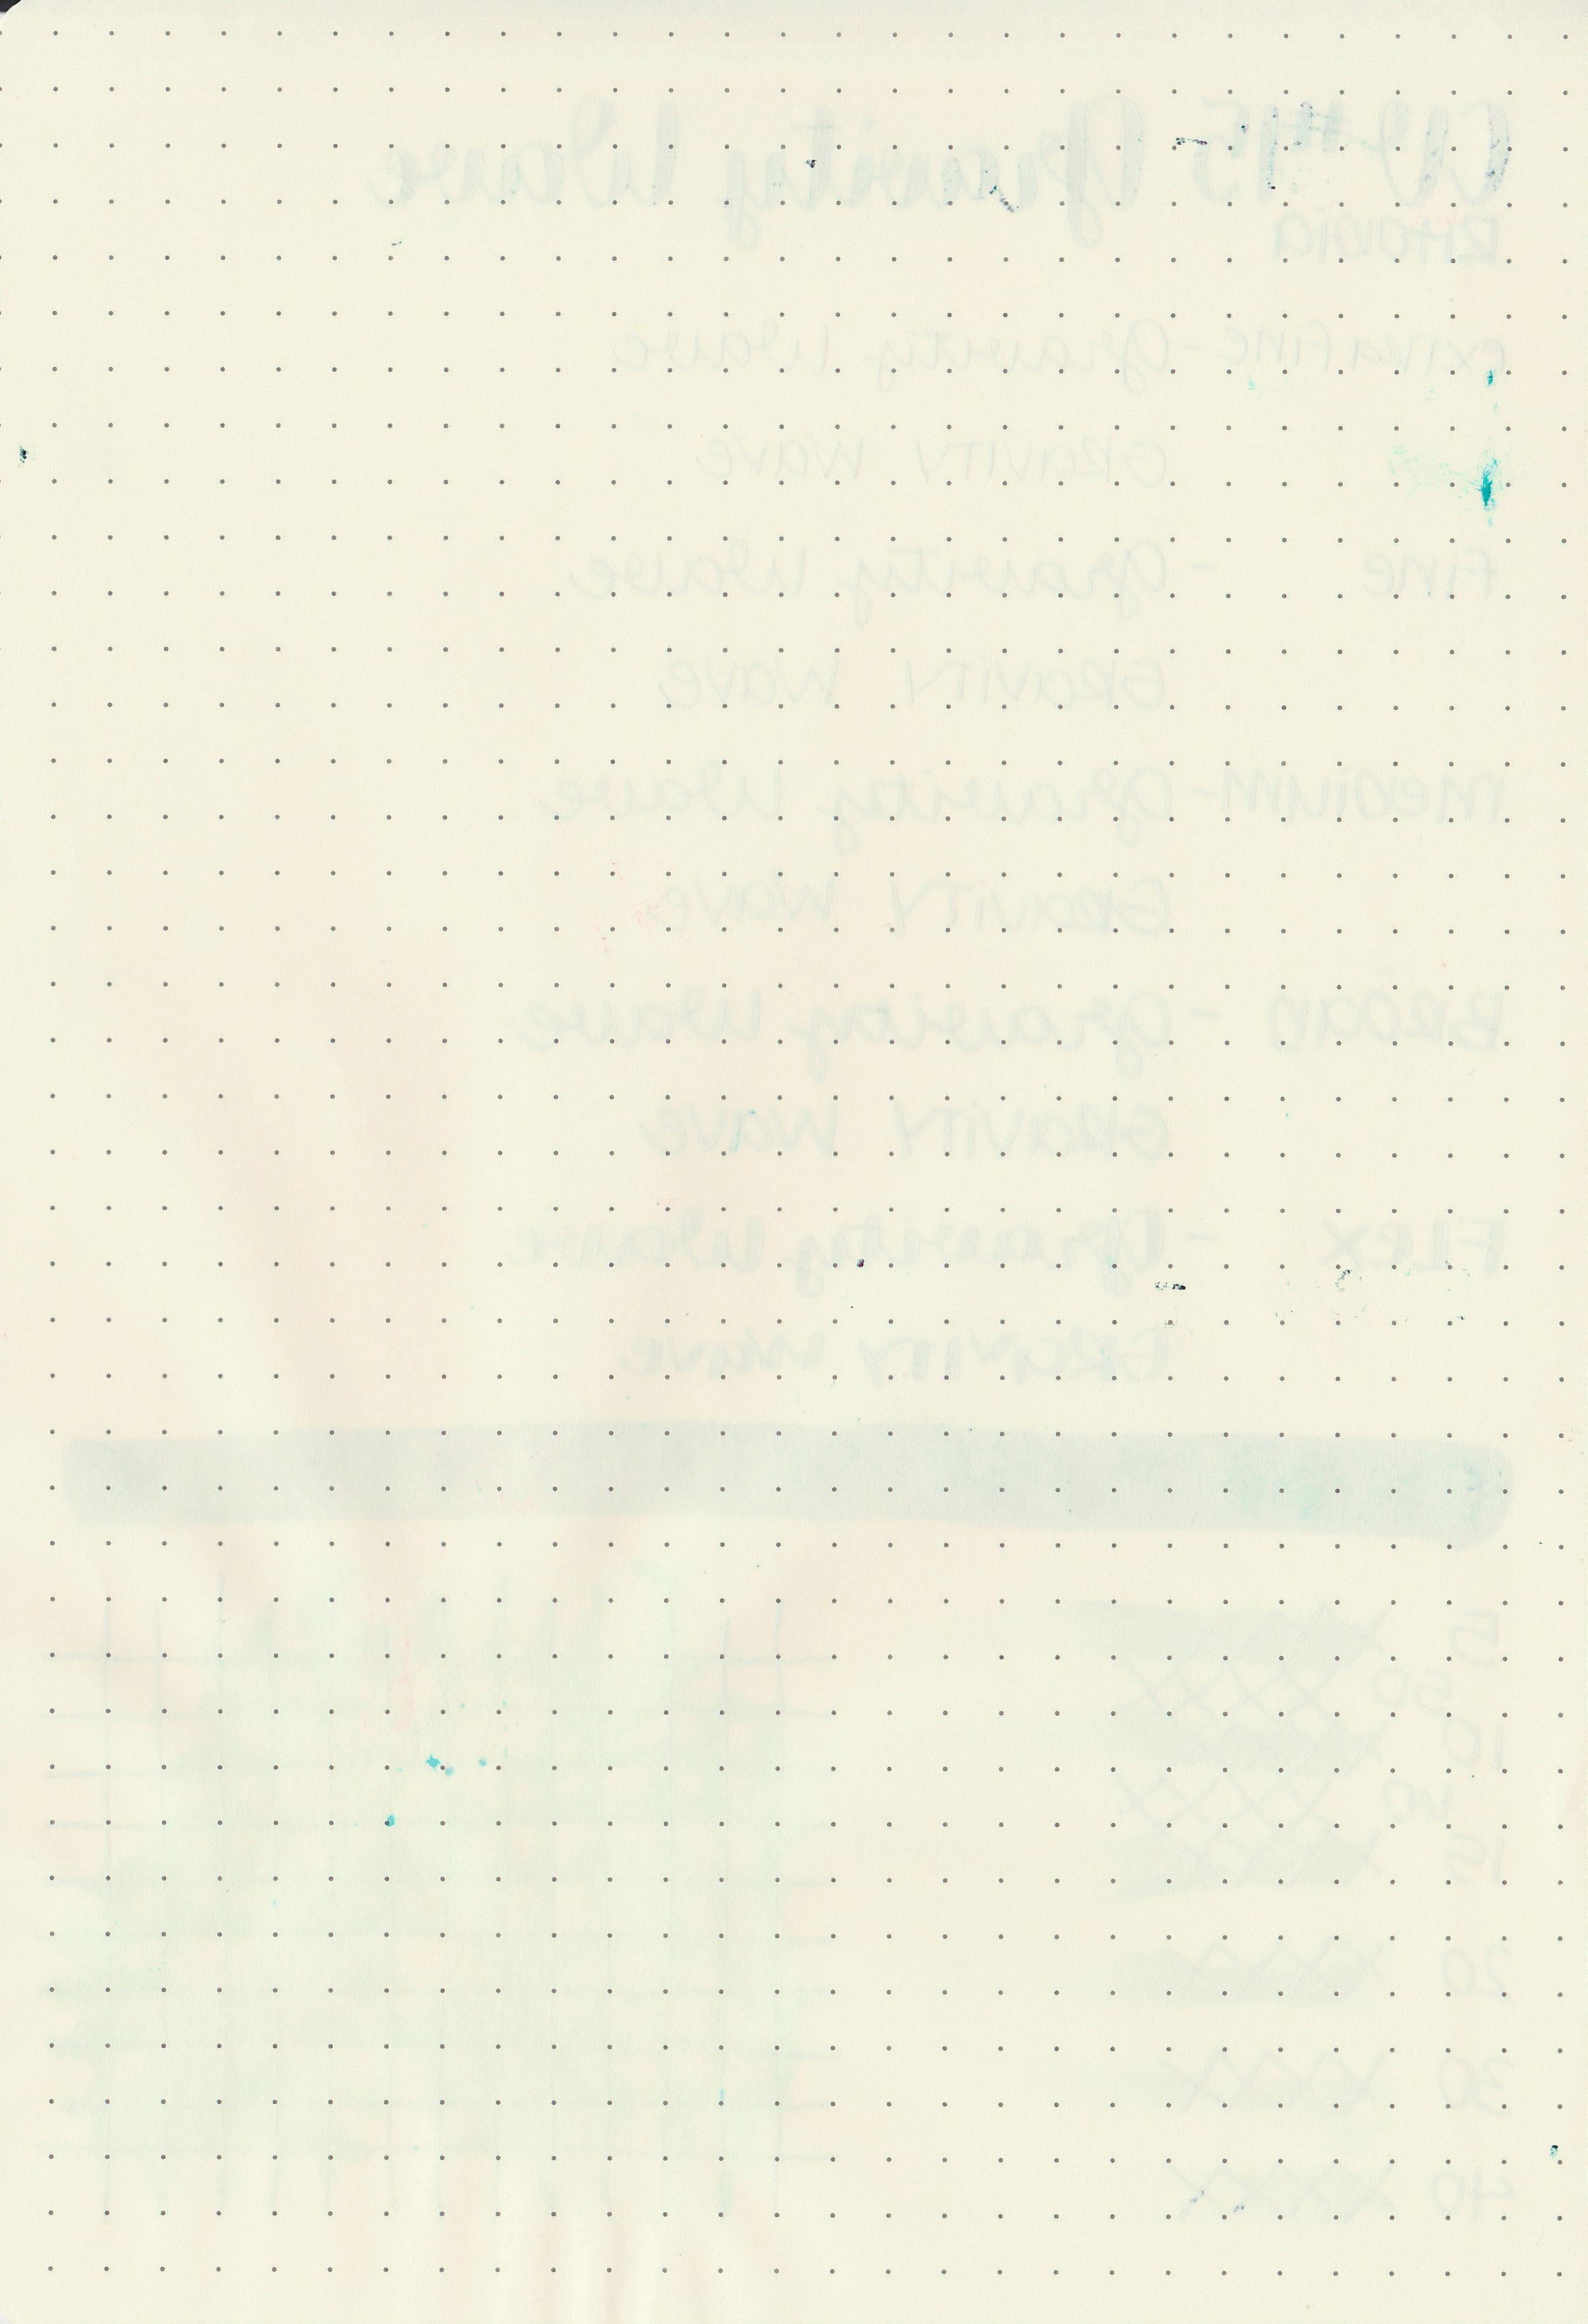 cv-gravity-wave-4.jpg